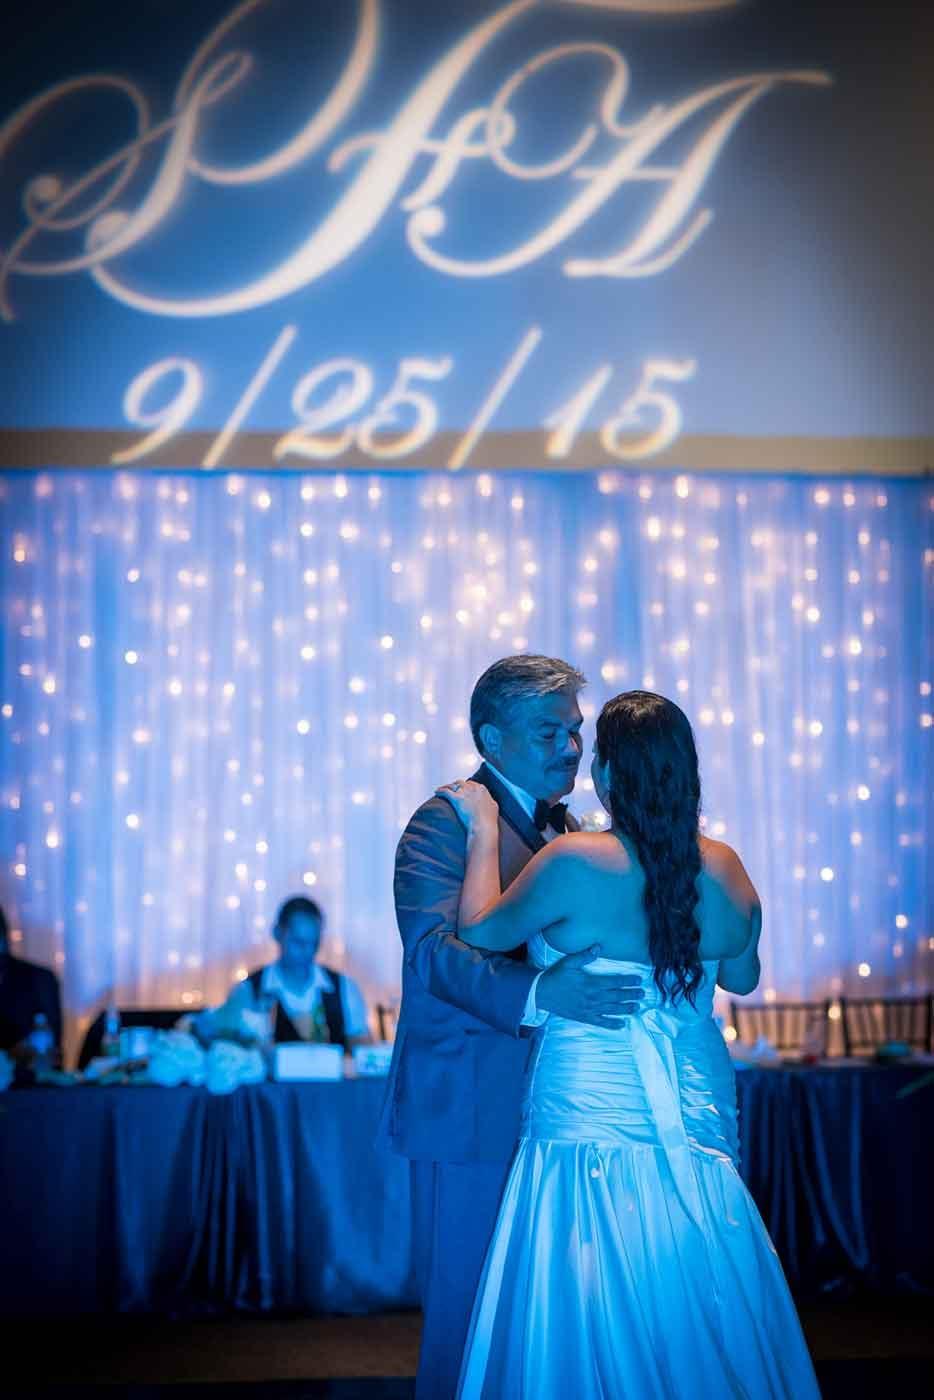 smlStef-+-Andy---Wed-Sept-25,-2015-552.jpg